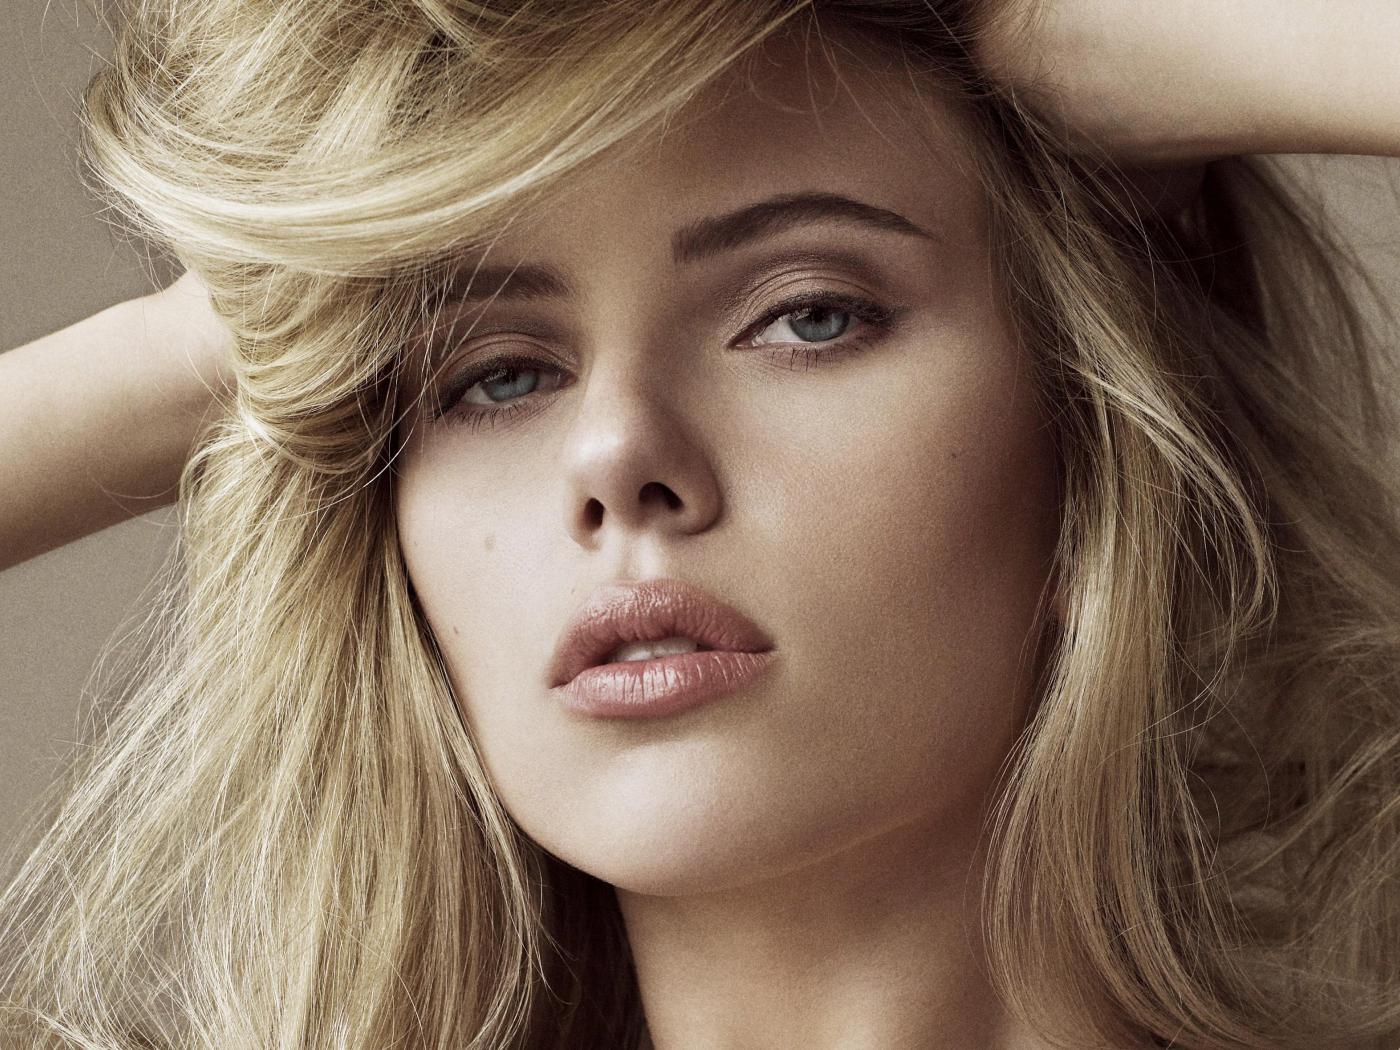 Desktop Wallpaper Scarlett Johansson Actress Blonde Face 4k Hd Image Picture Background 2f2fec